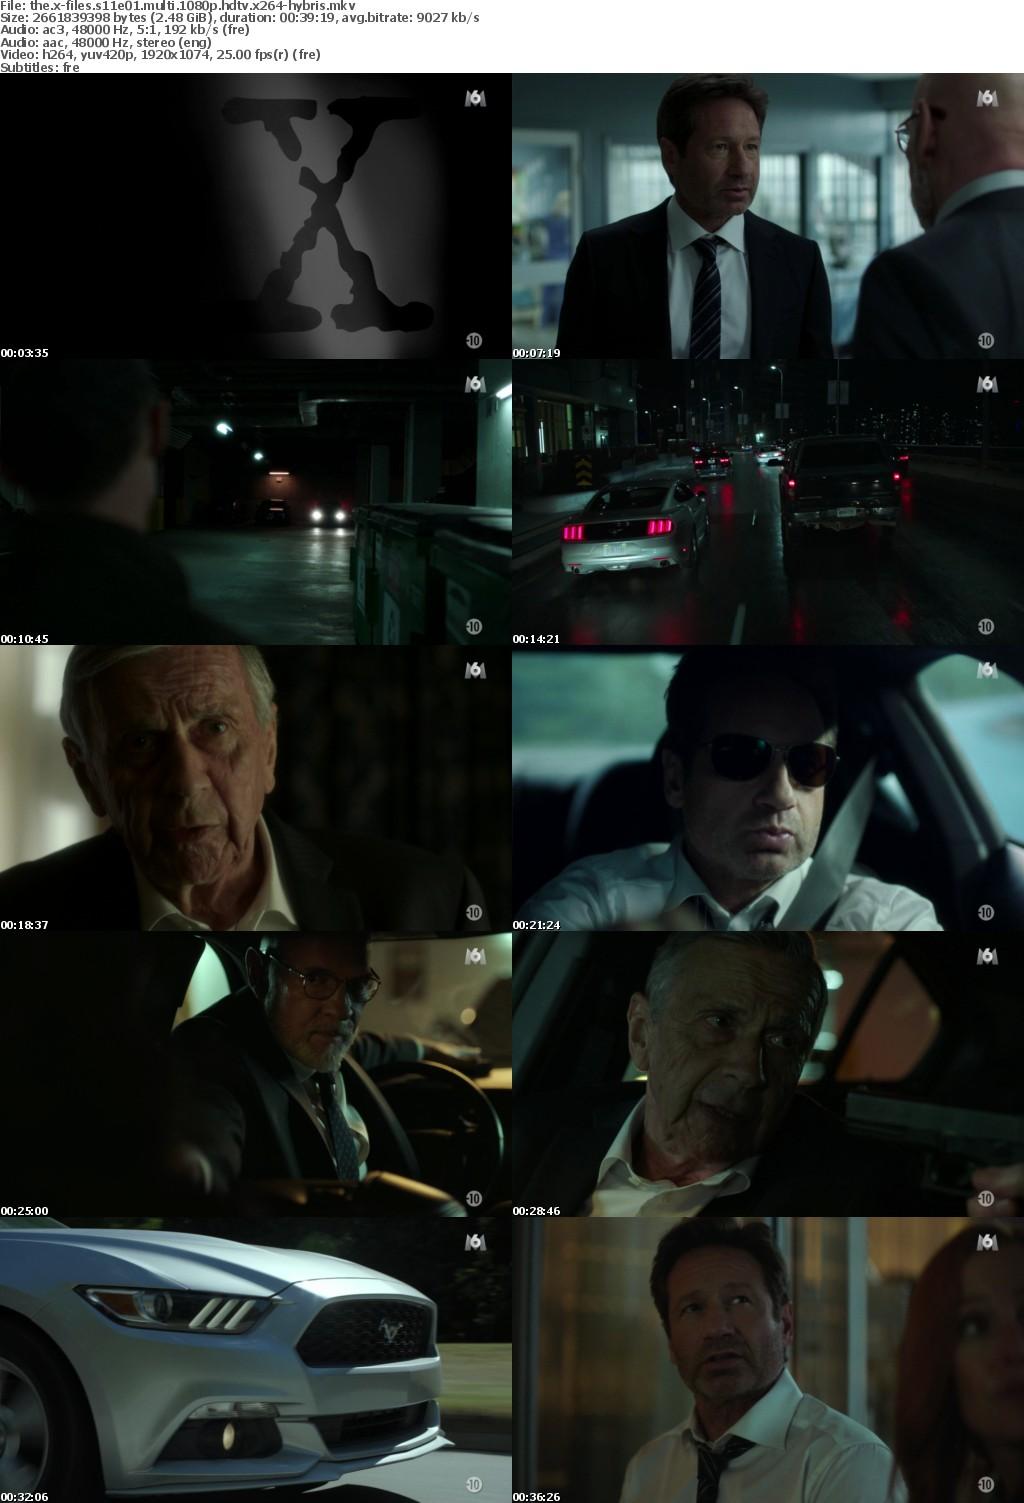 The X-Files S11E01 MULTi 1080p HDTV x264-HYBRiS